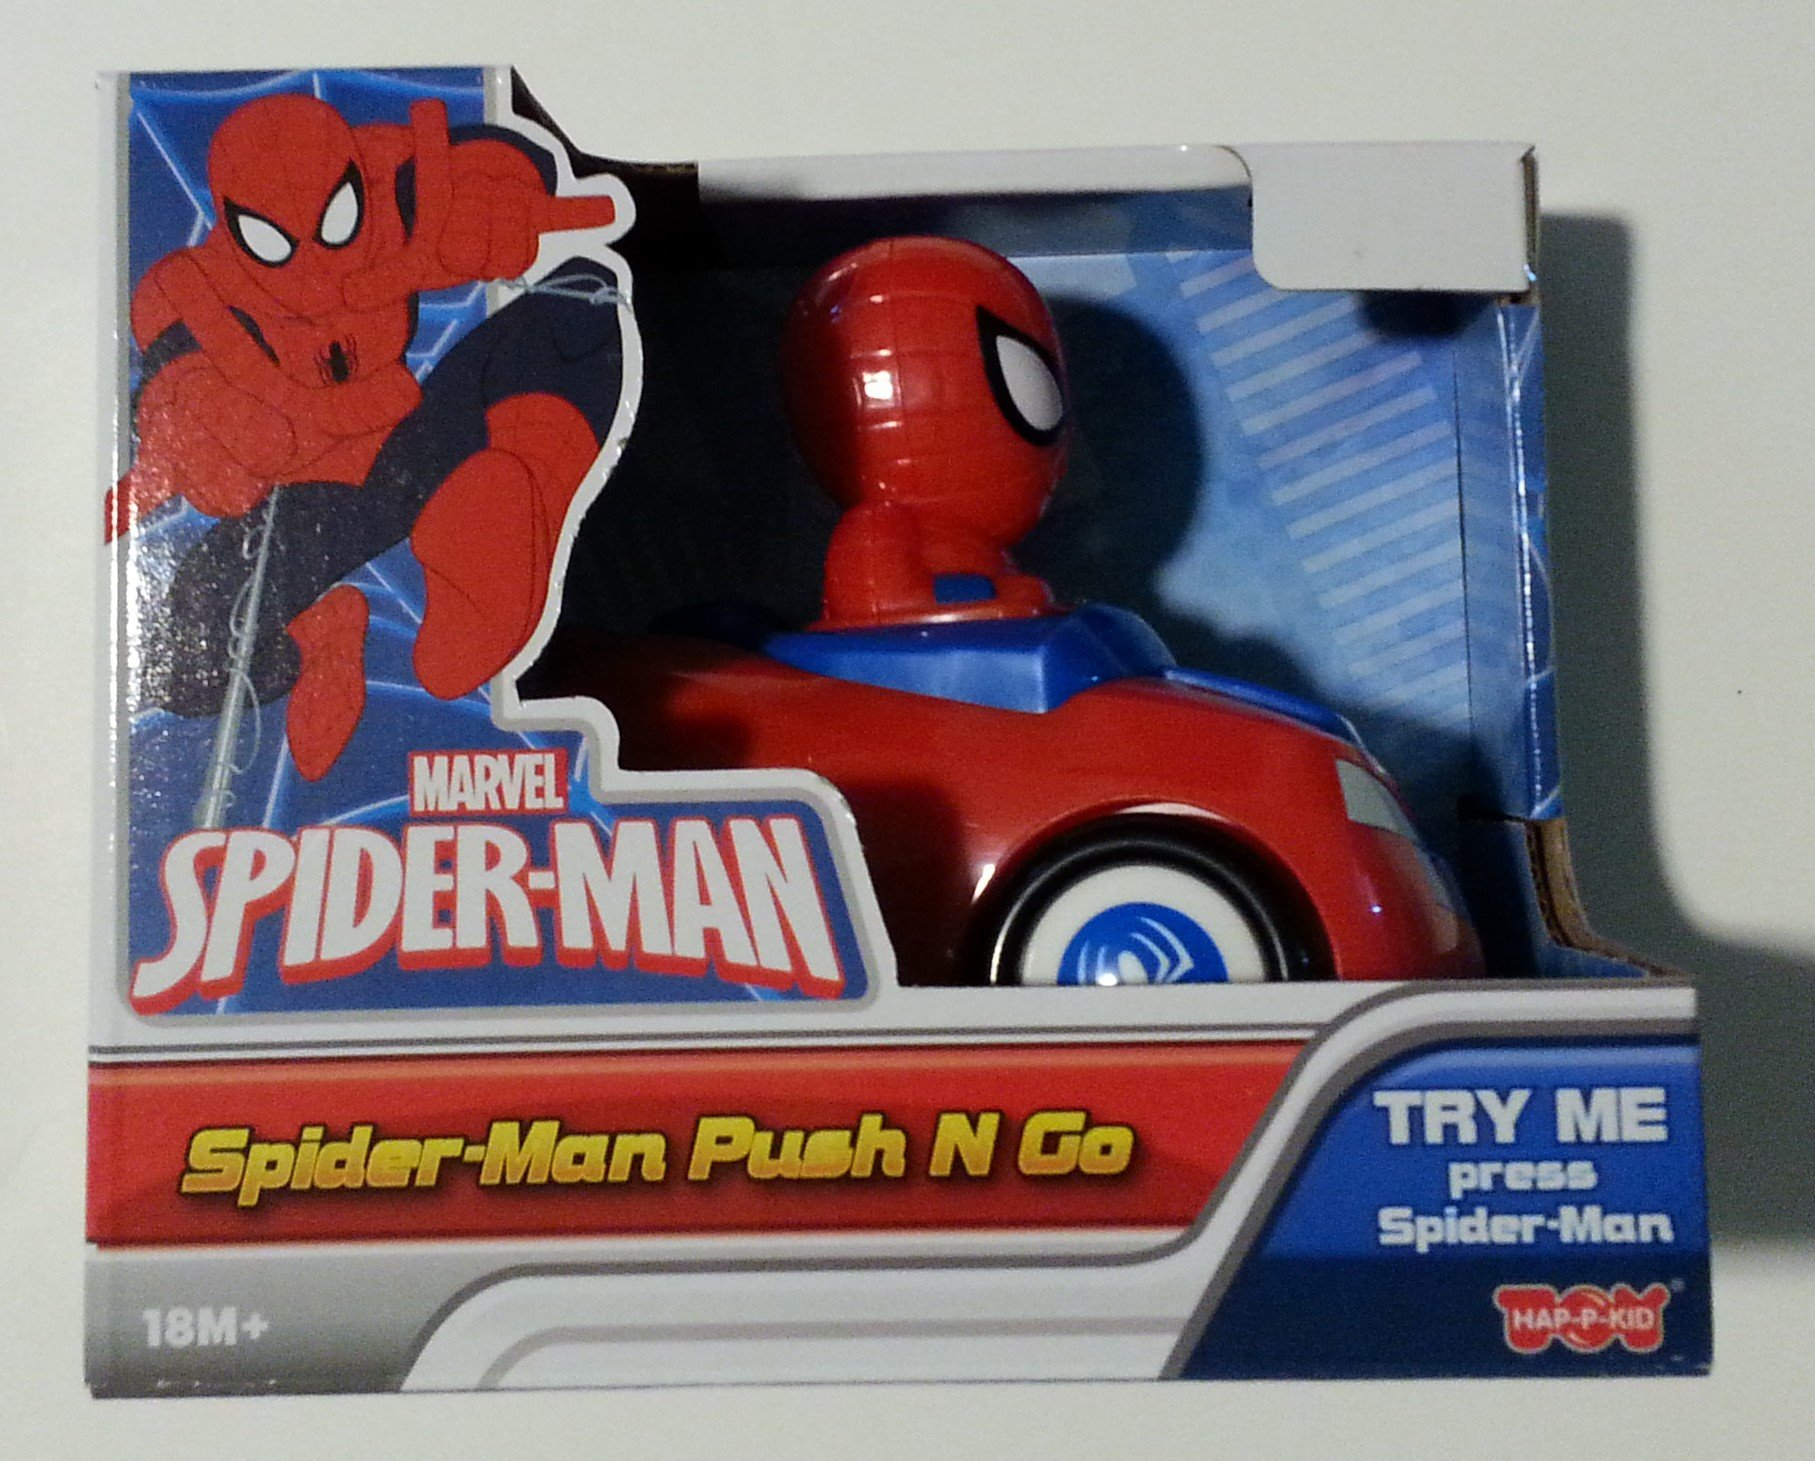 Marvel Spiderman Push N Go